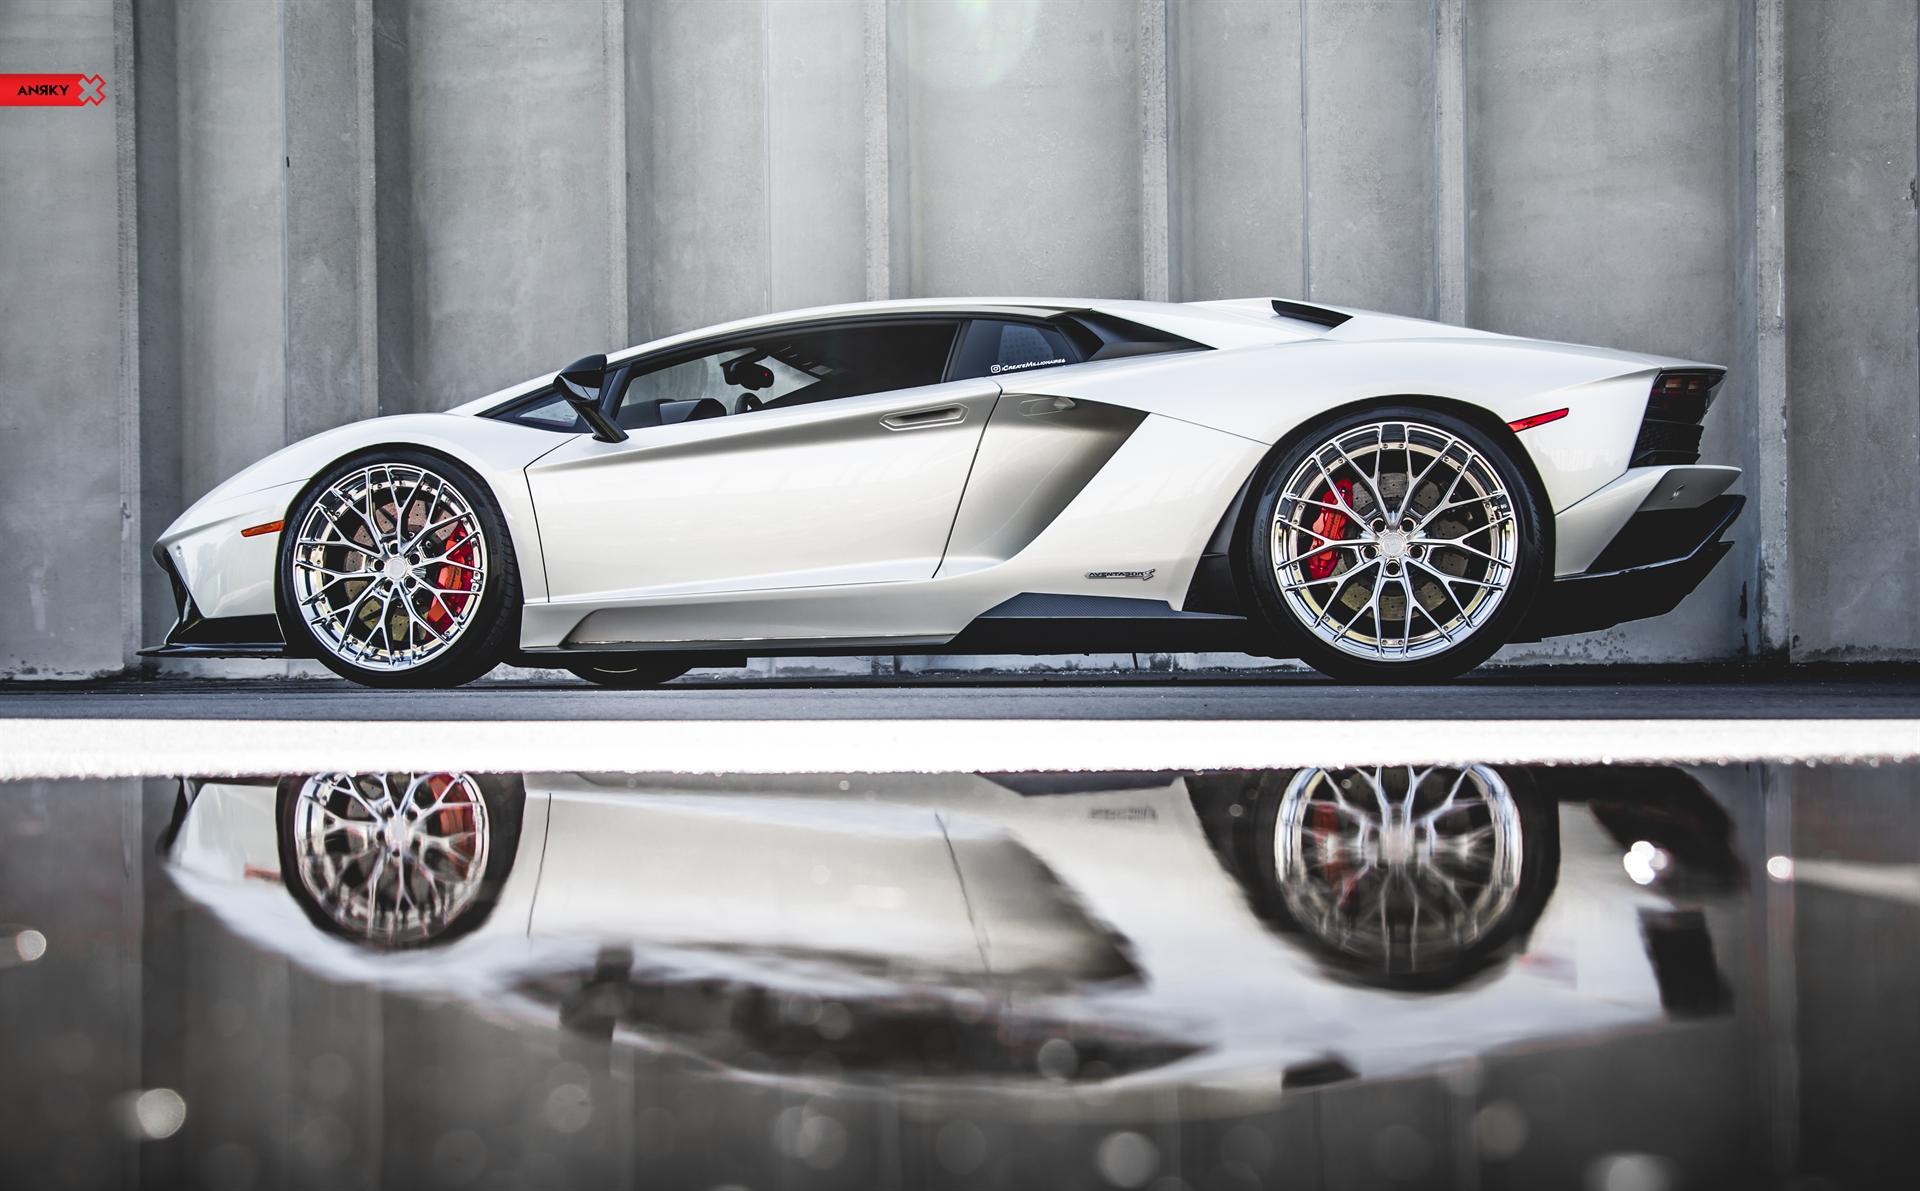 Lamborghini Aventador S – AN20 SeriesTWO